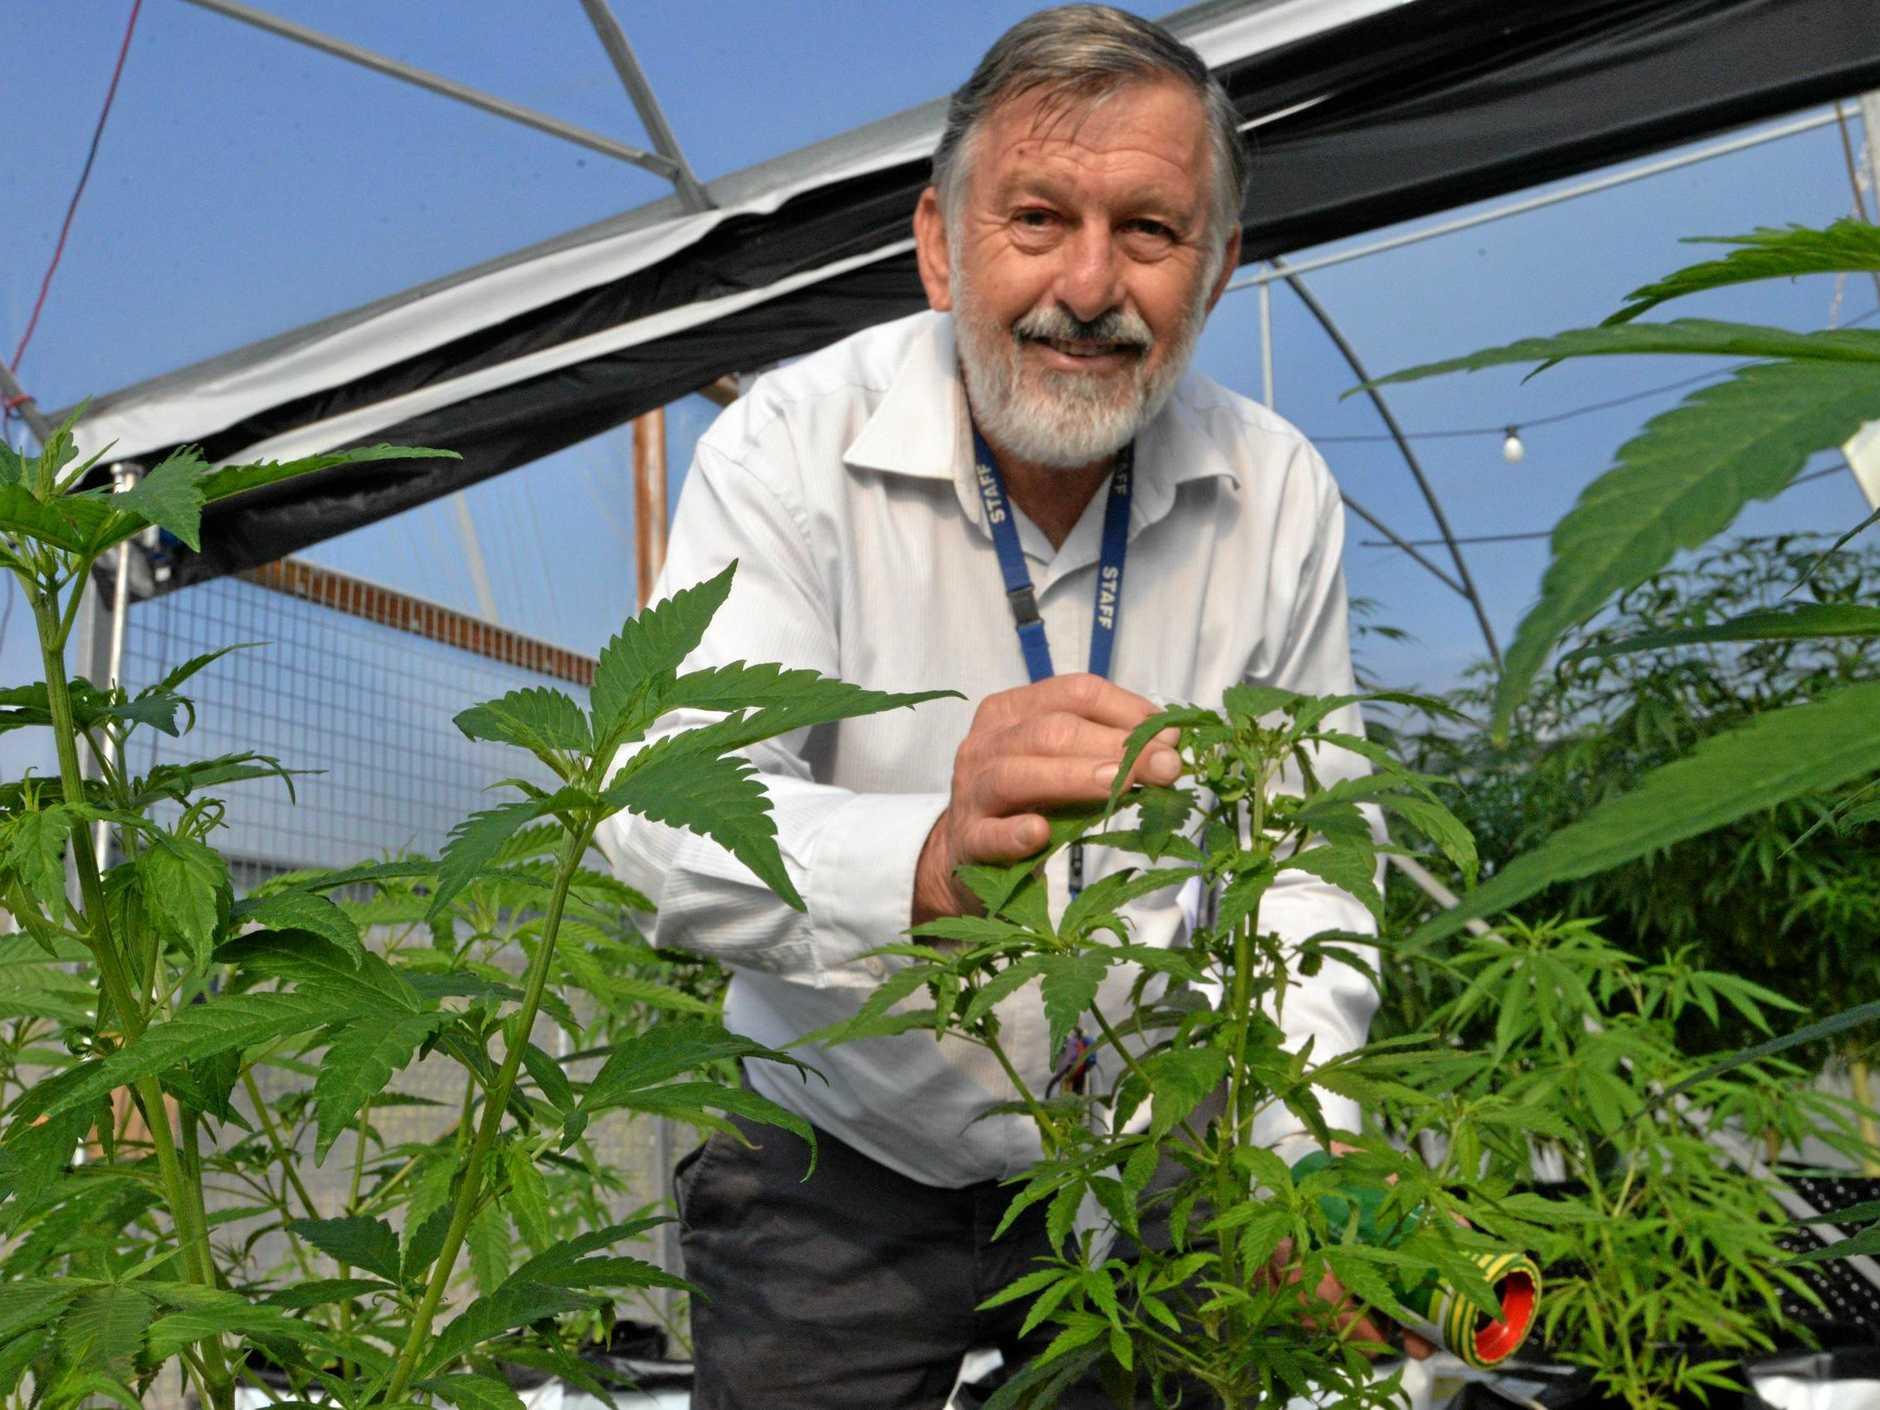 GREEN LIGHT: John Hall with medicinal cannabis plants.